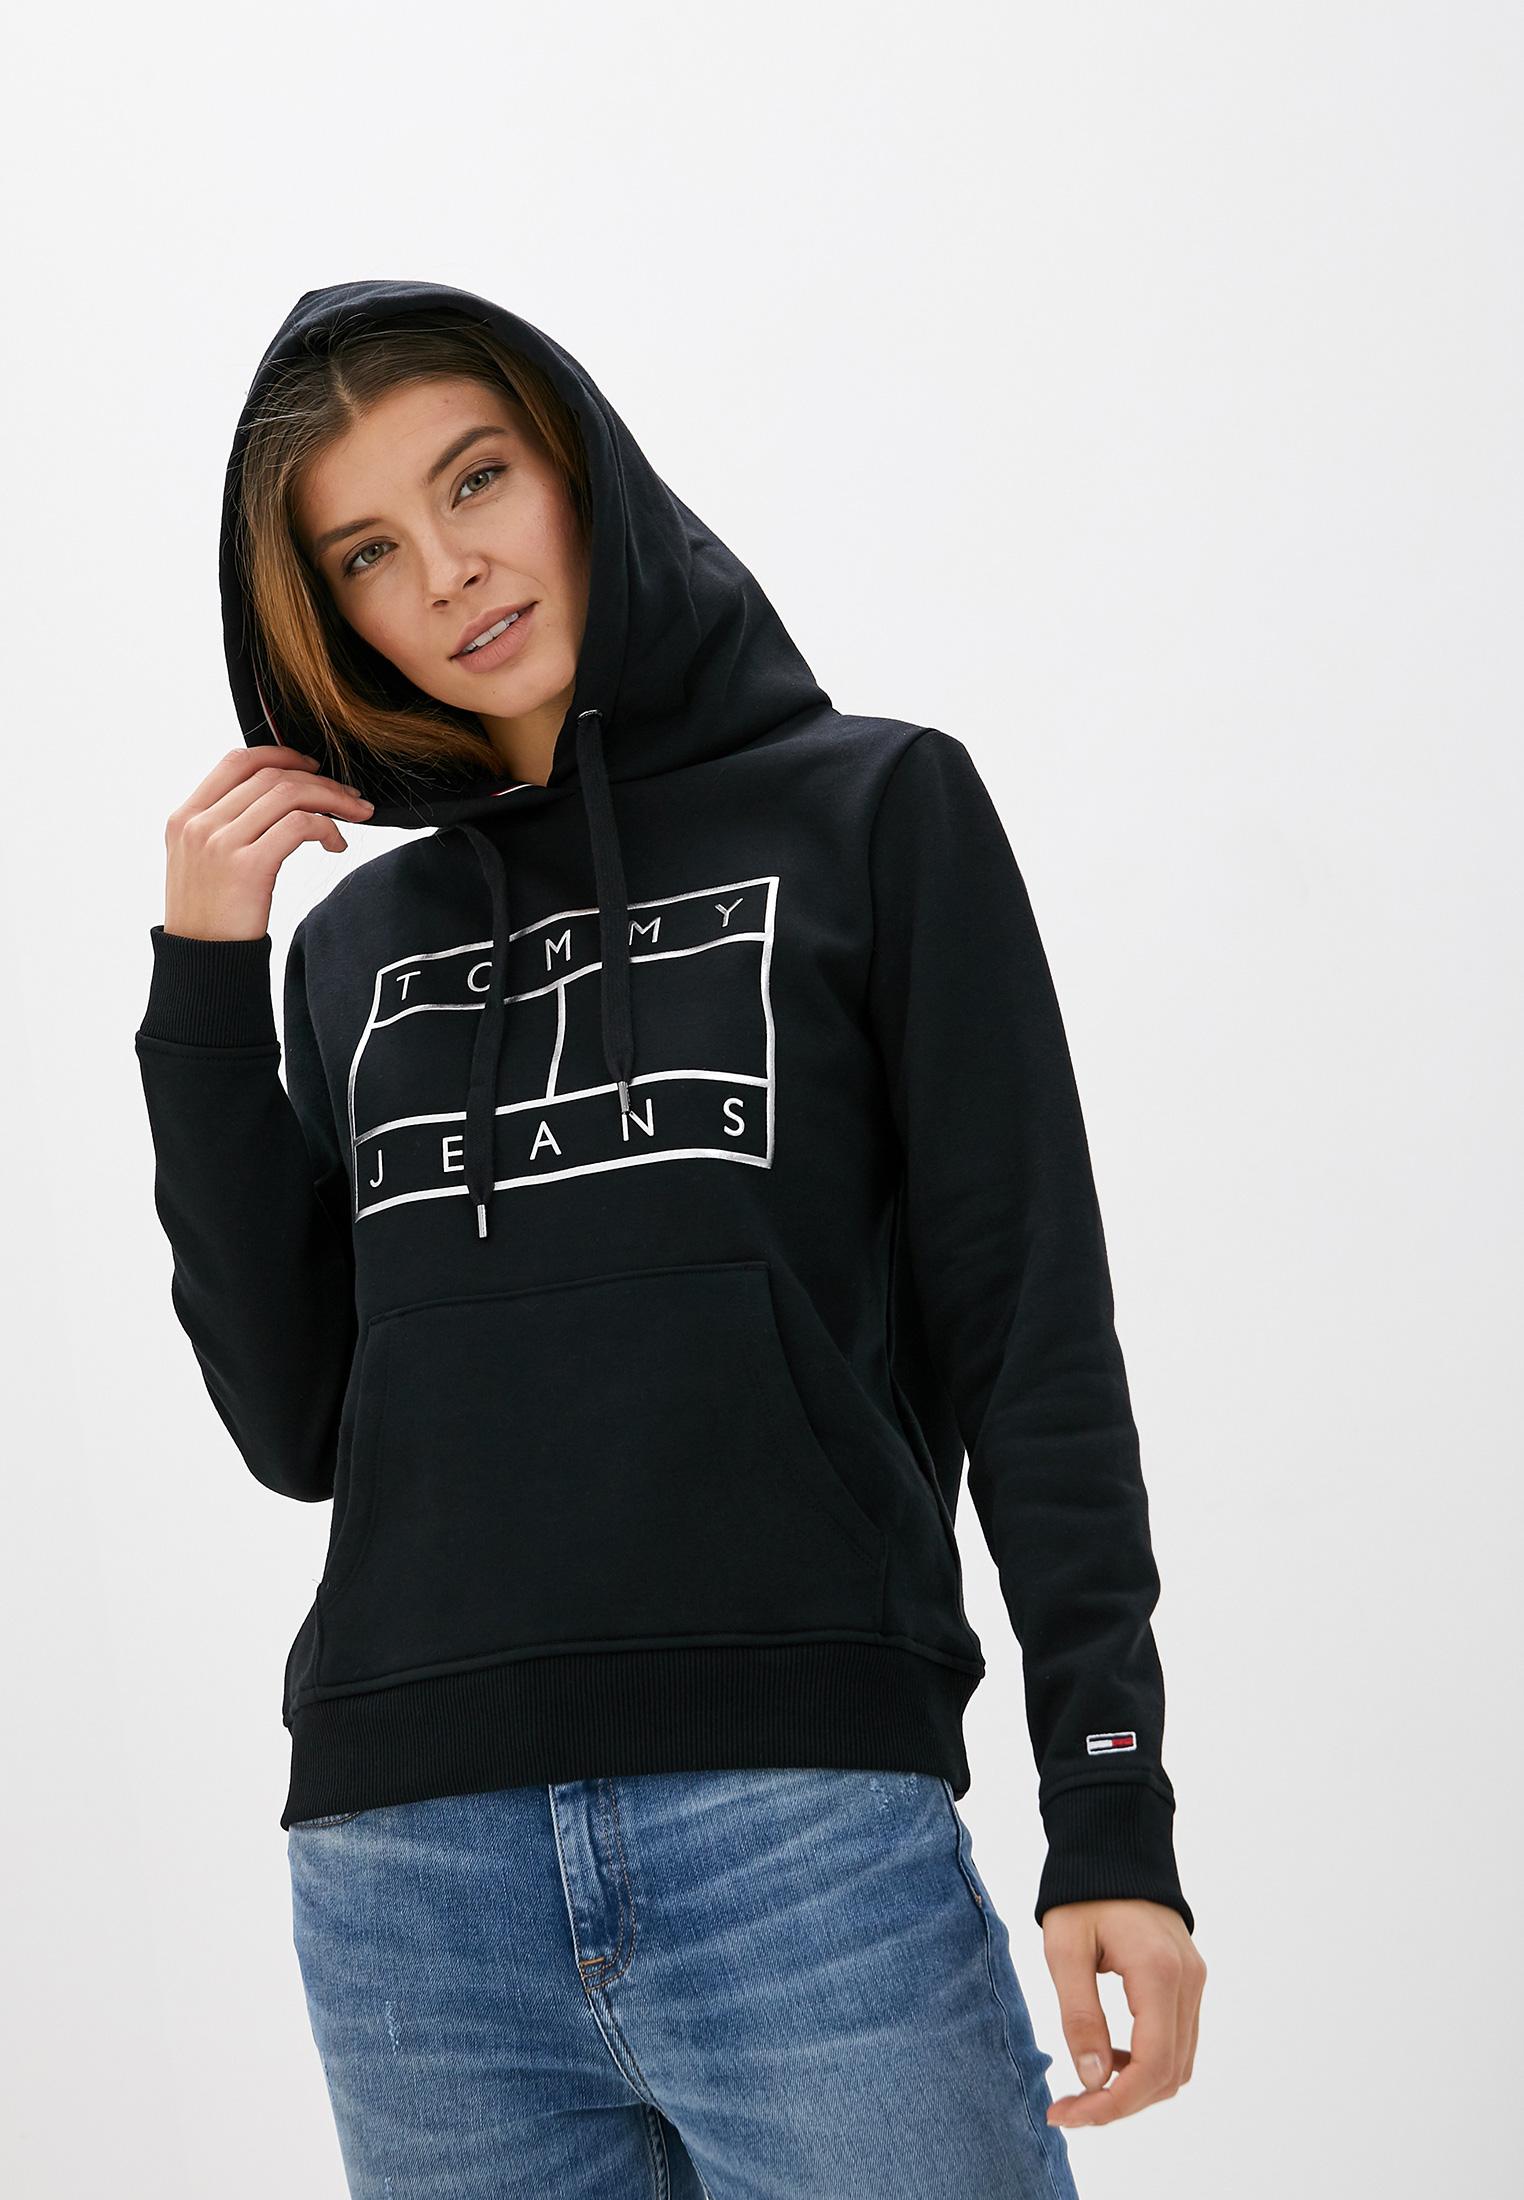 Худи Tommy Jeans  купить за 5 940 ₽ в интернет-магазине Lamoda.ru